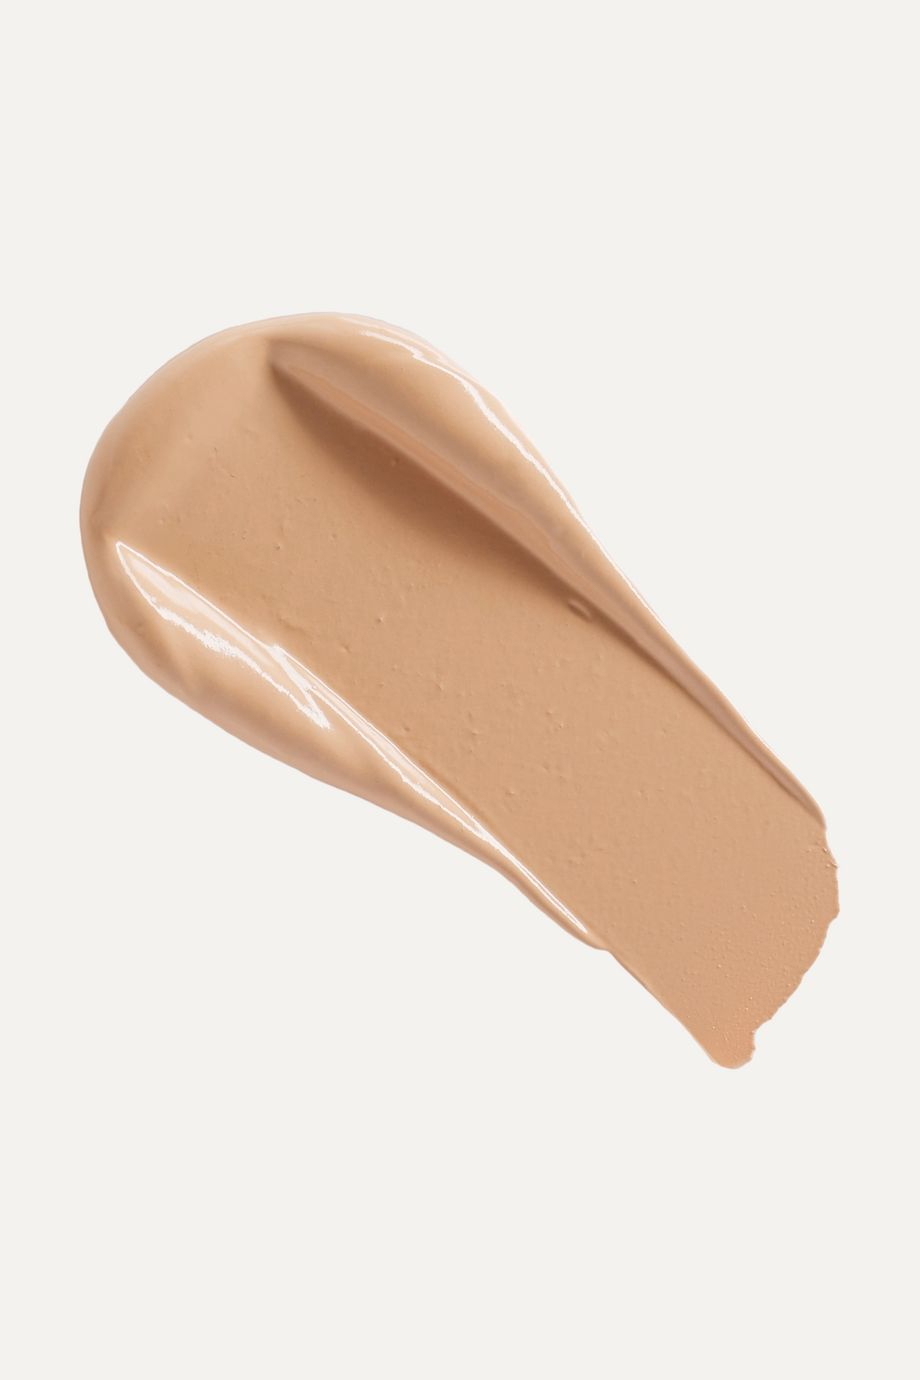 Illamasqua Stylo correcteur Skin Base, Medium 1